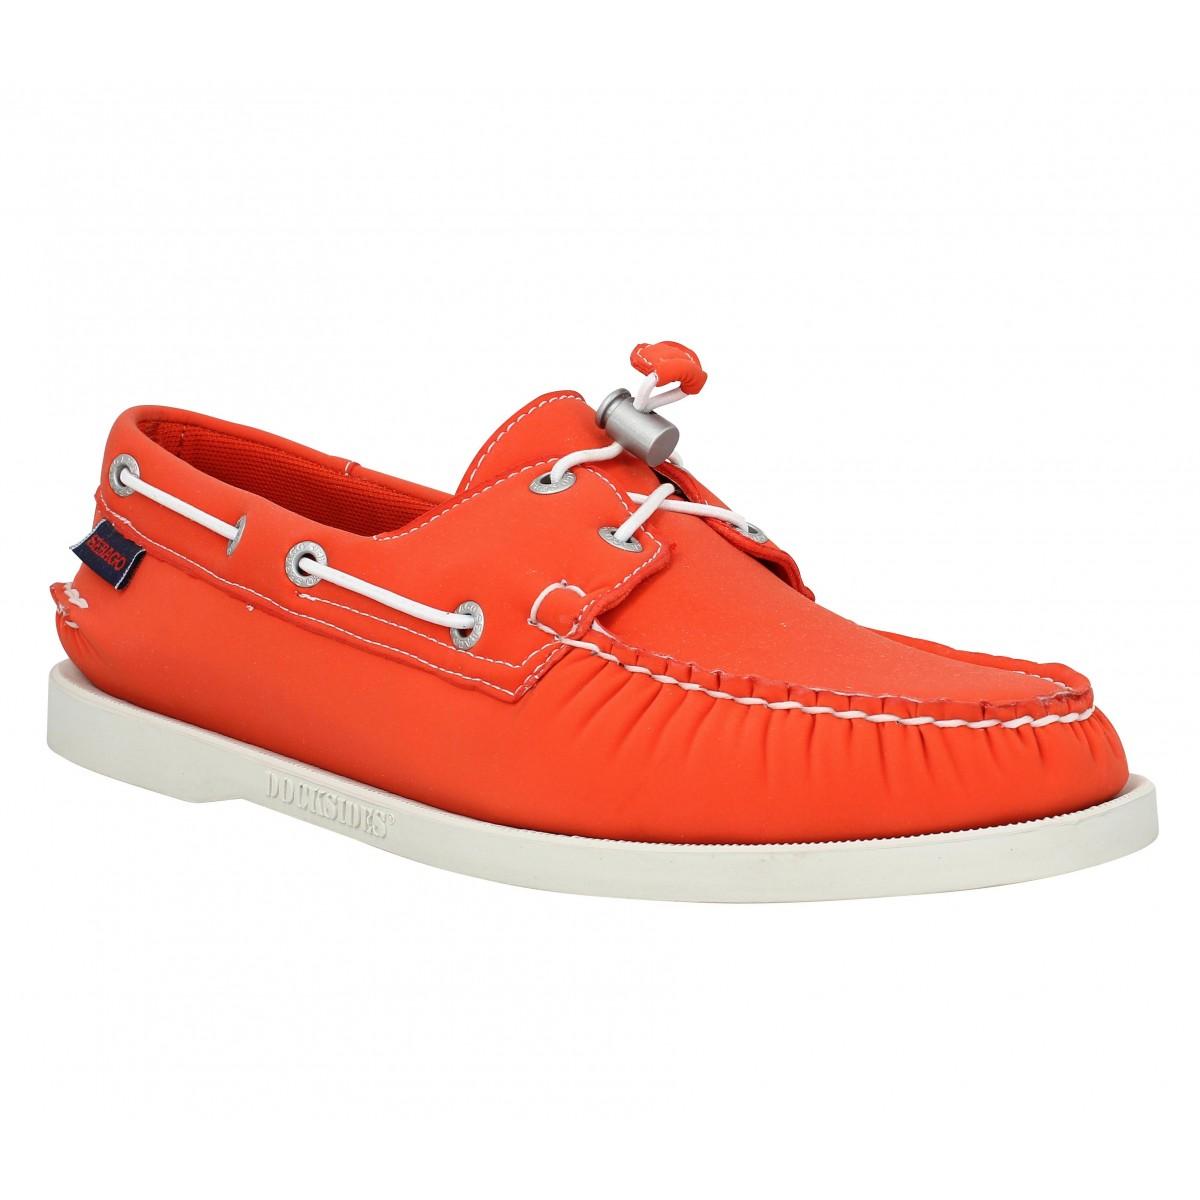 Chaussures bateaux SEBAGO Docksides neoprene Homme Orange